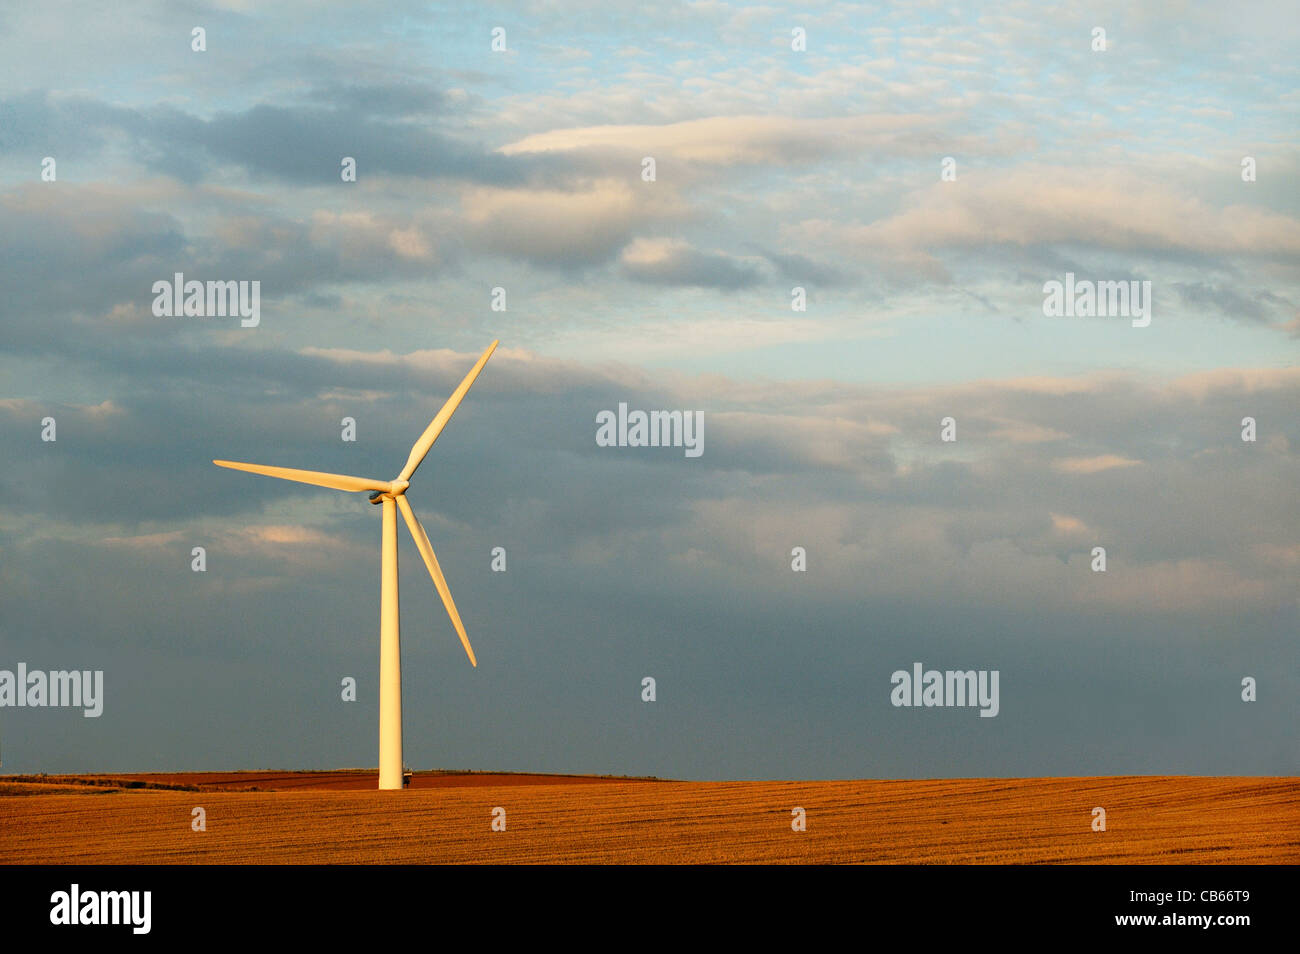 Wind farm turbine on rich crop soil farm land at Easington, Holderness, East Yorkshire, on east coast of England, - Stock Image